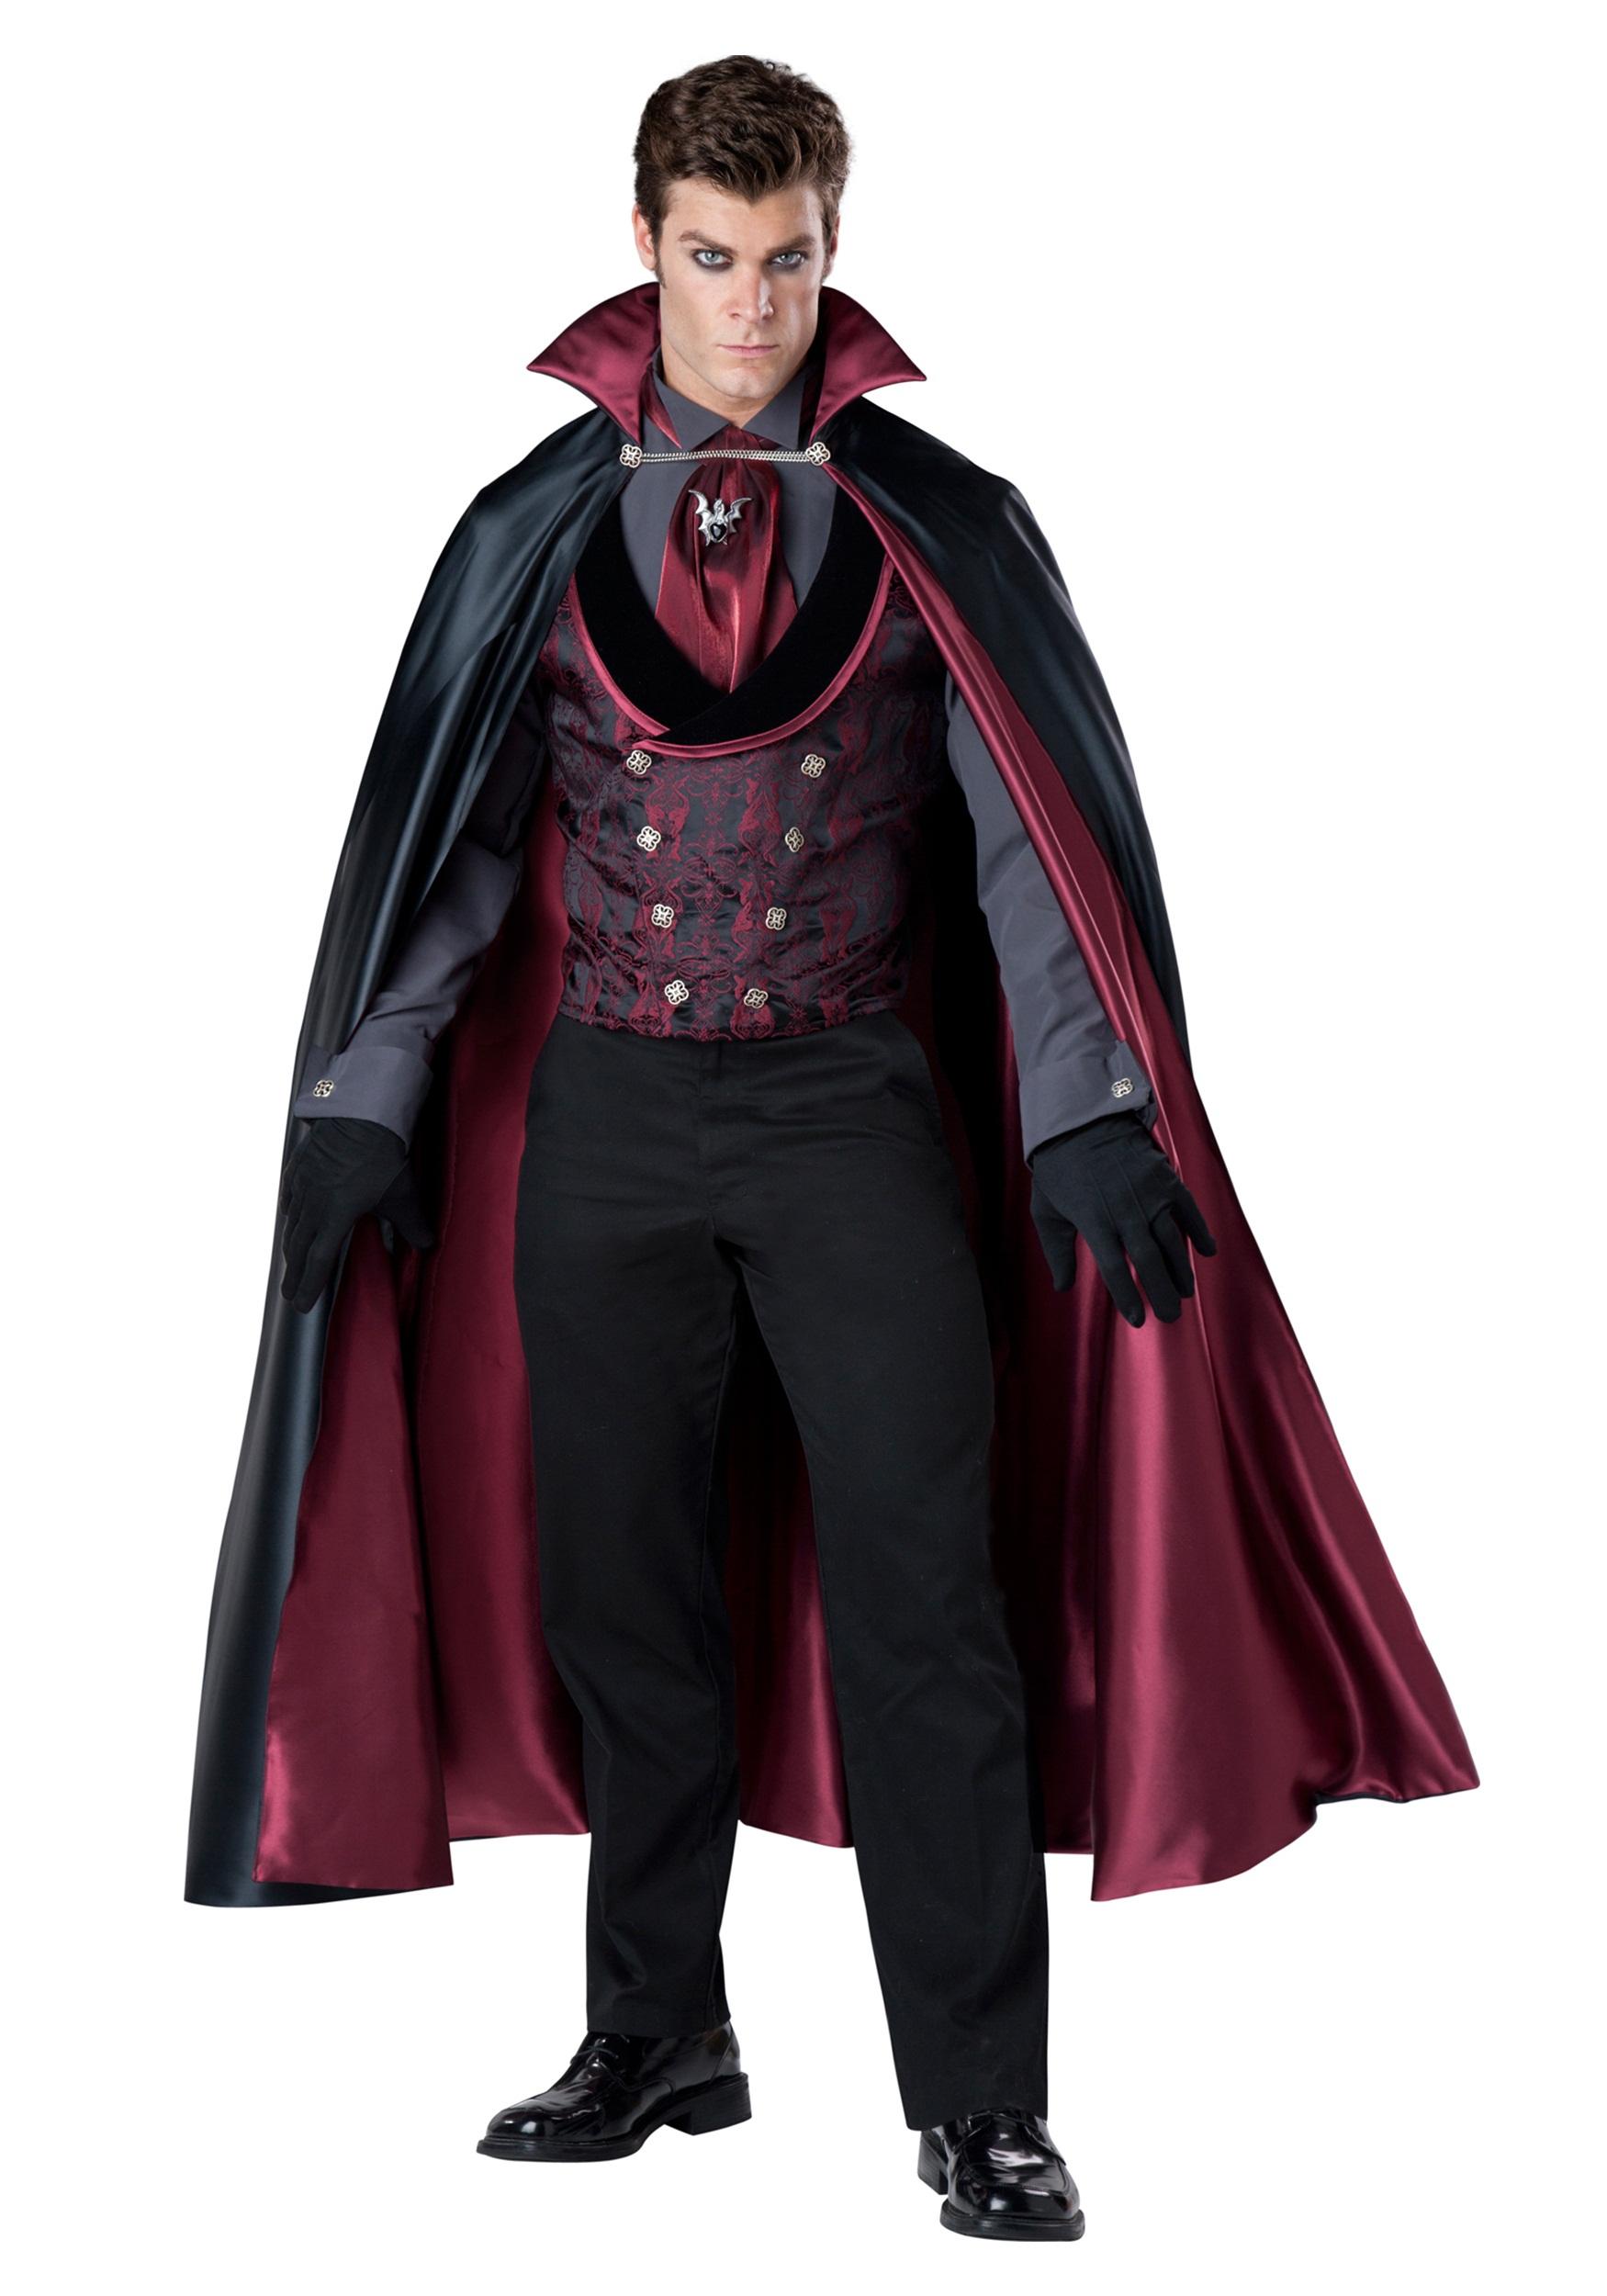 Sexy Vampire Costume Men : vampire, costume, Nocturnal, Count, Vampire, Costume